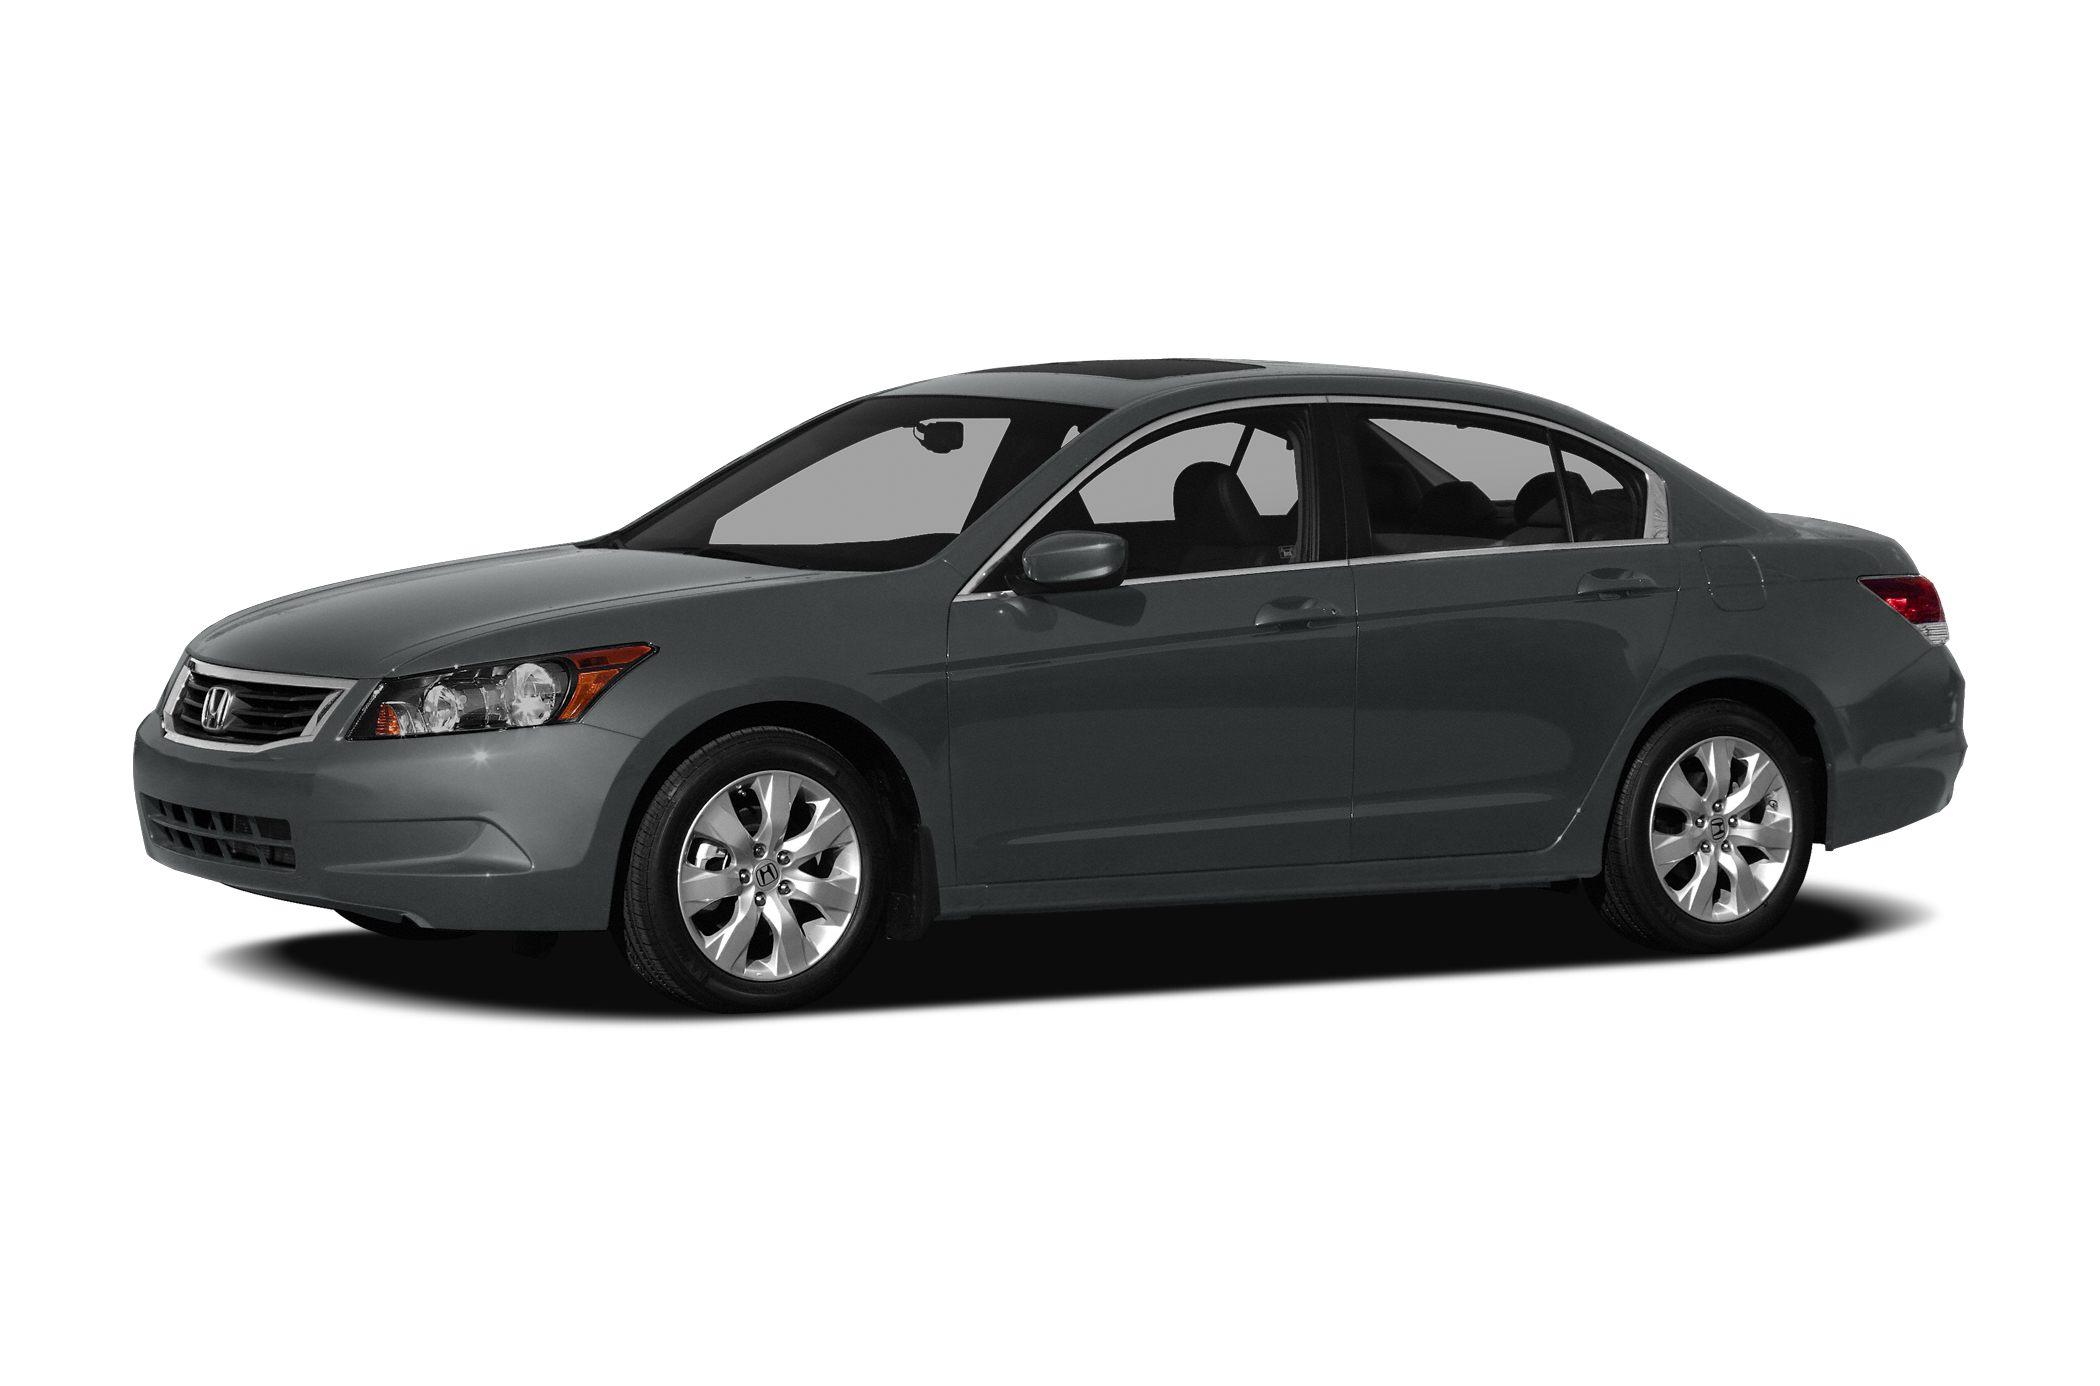 2009 Honda Accord Specs and Prices